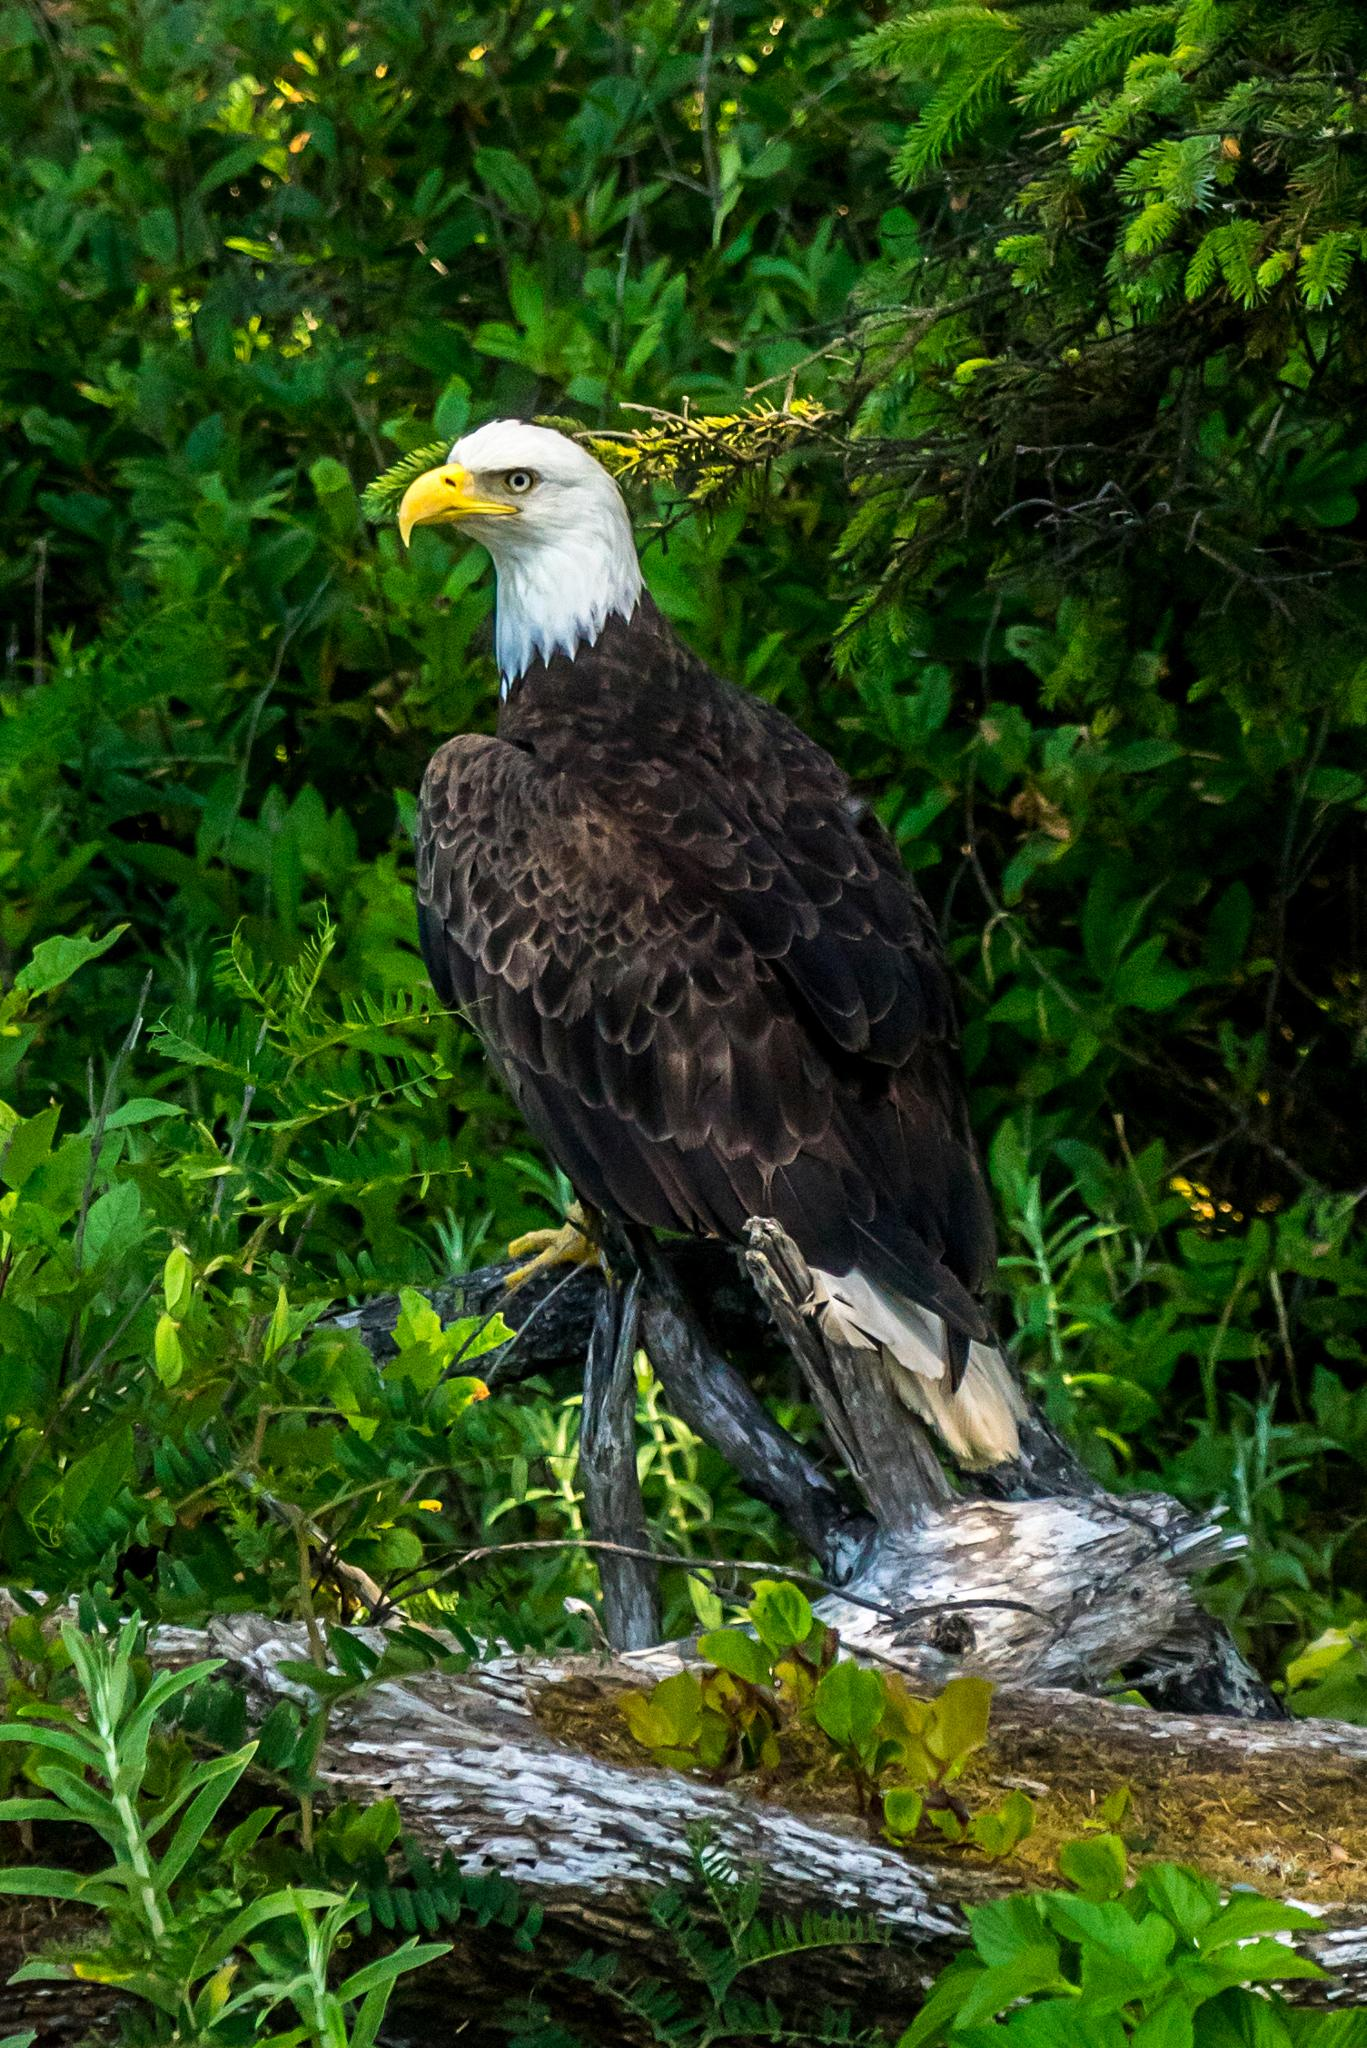 Rialto Beach Bald Eagle by Yanqiang Dai